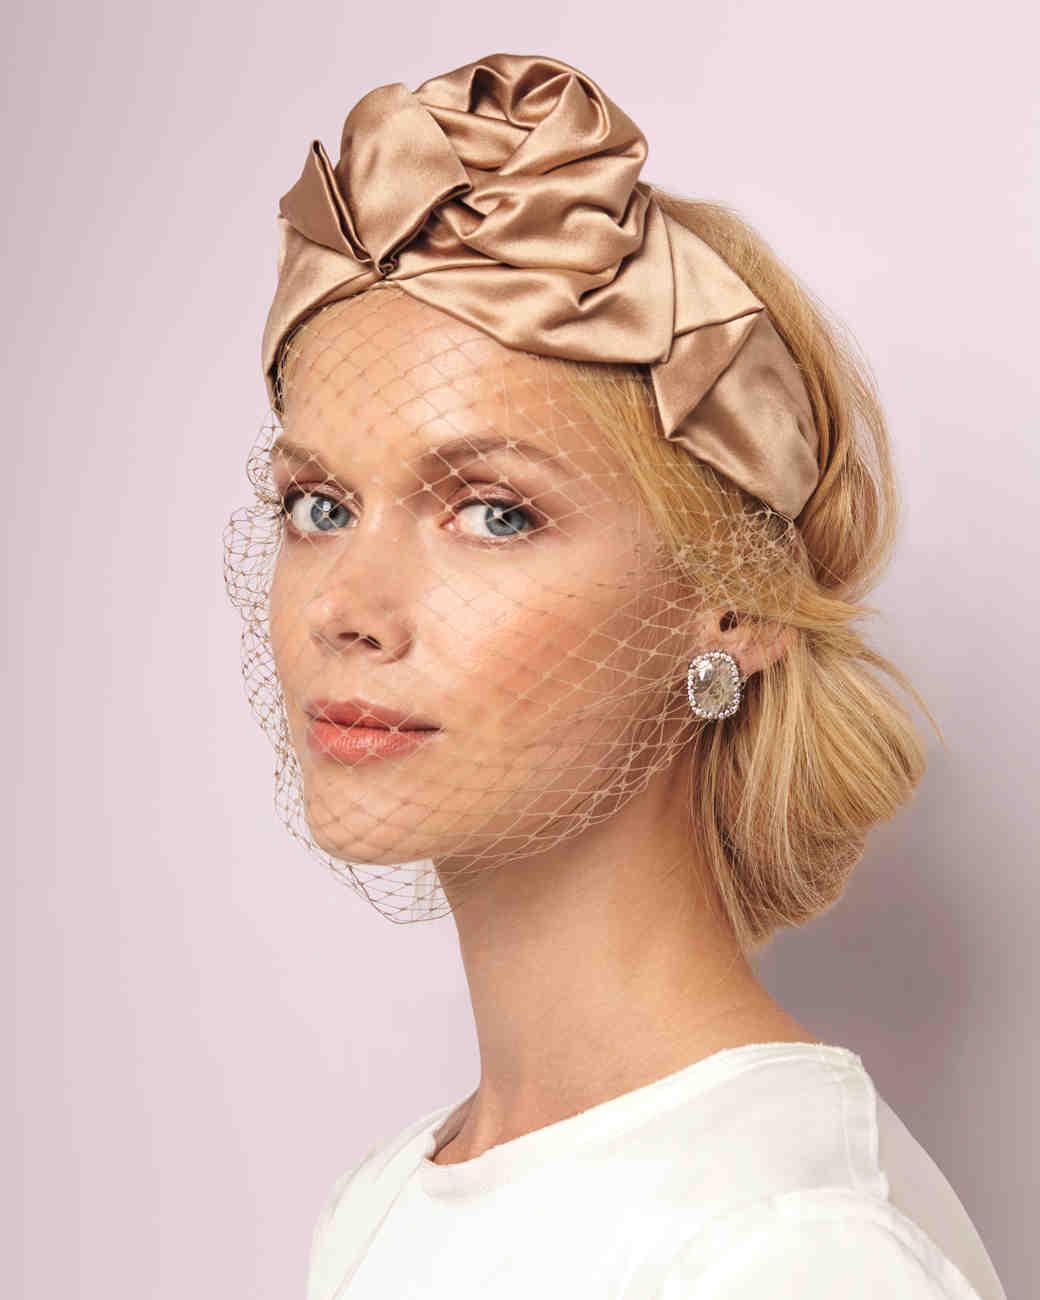 02-adorned-long-blonde-hair-veil-hat-091-d111402.jpg